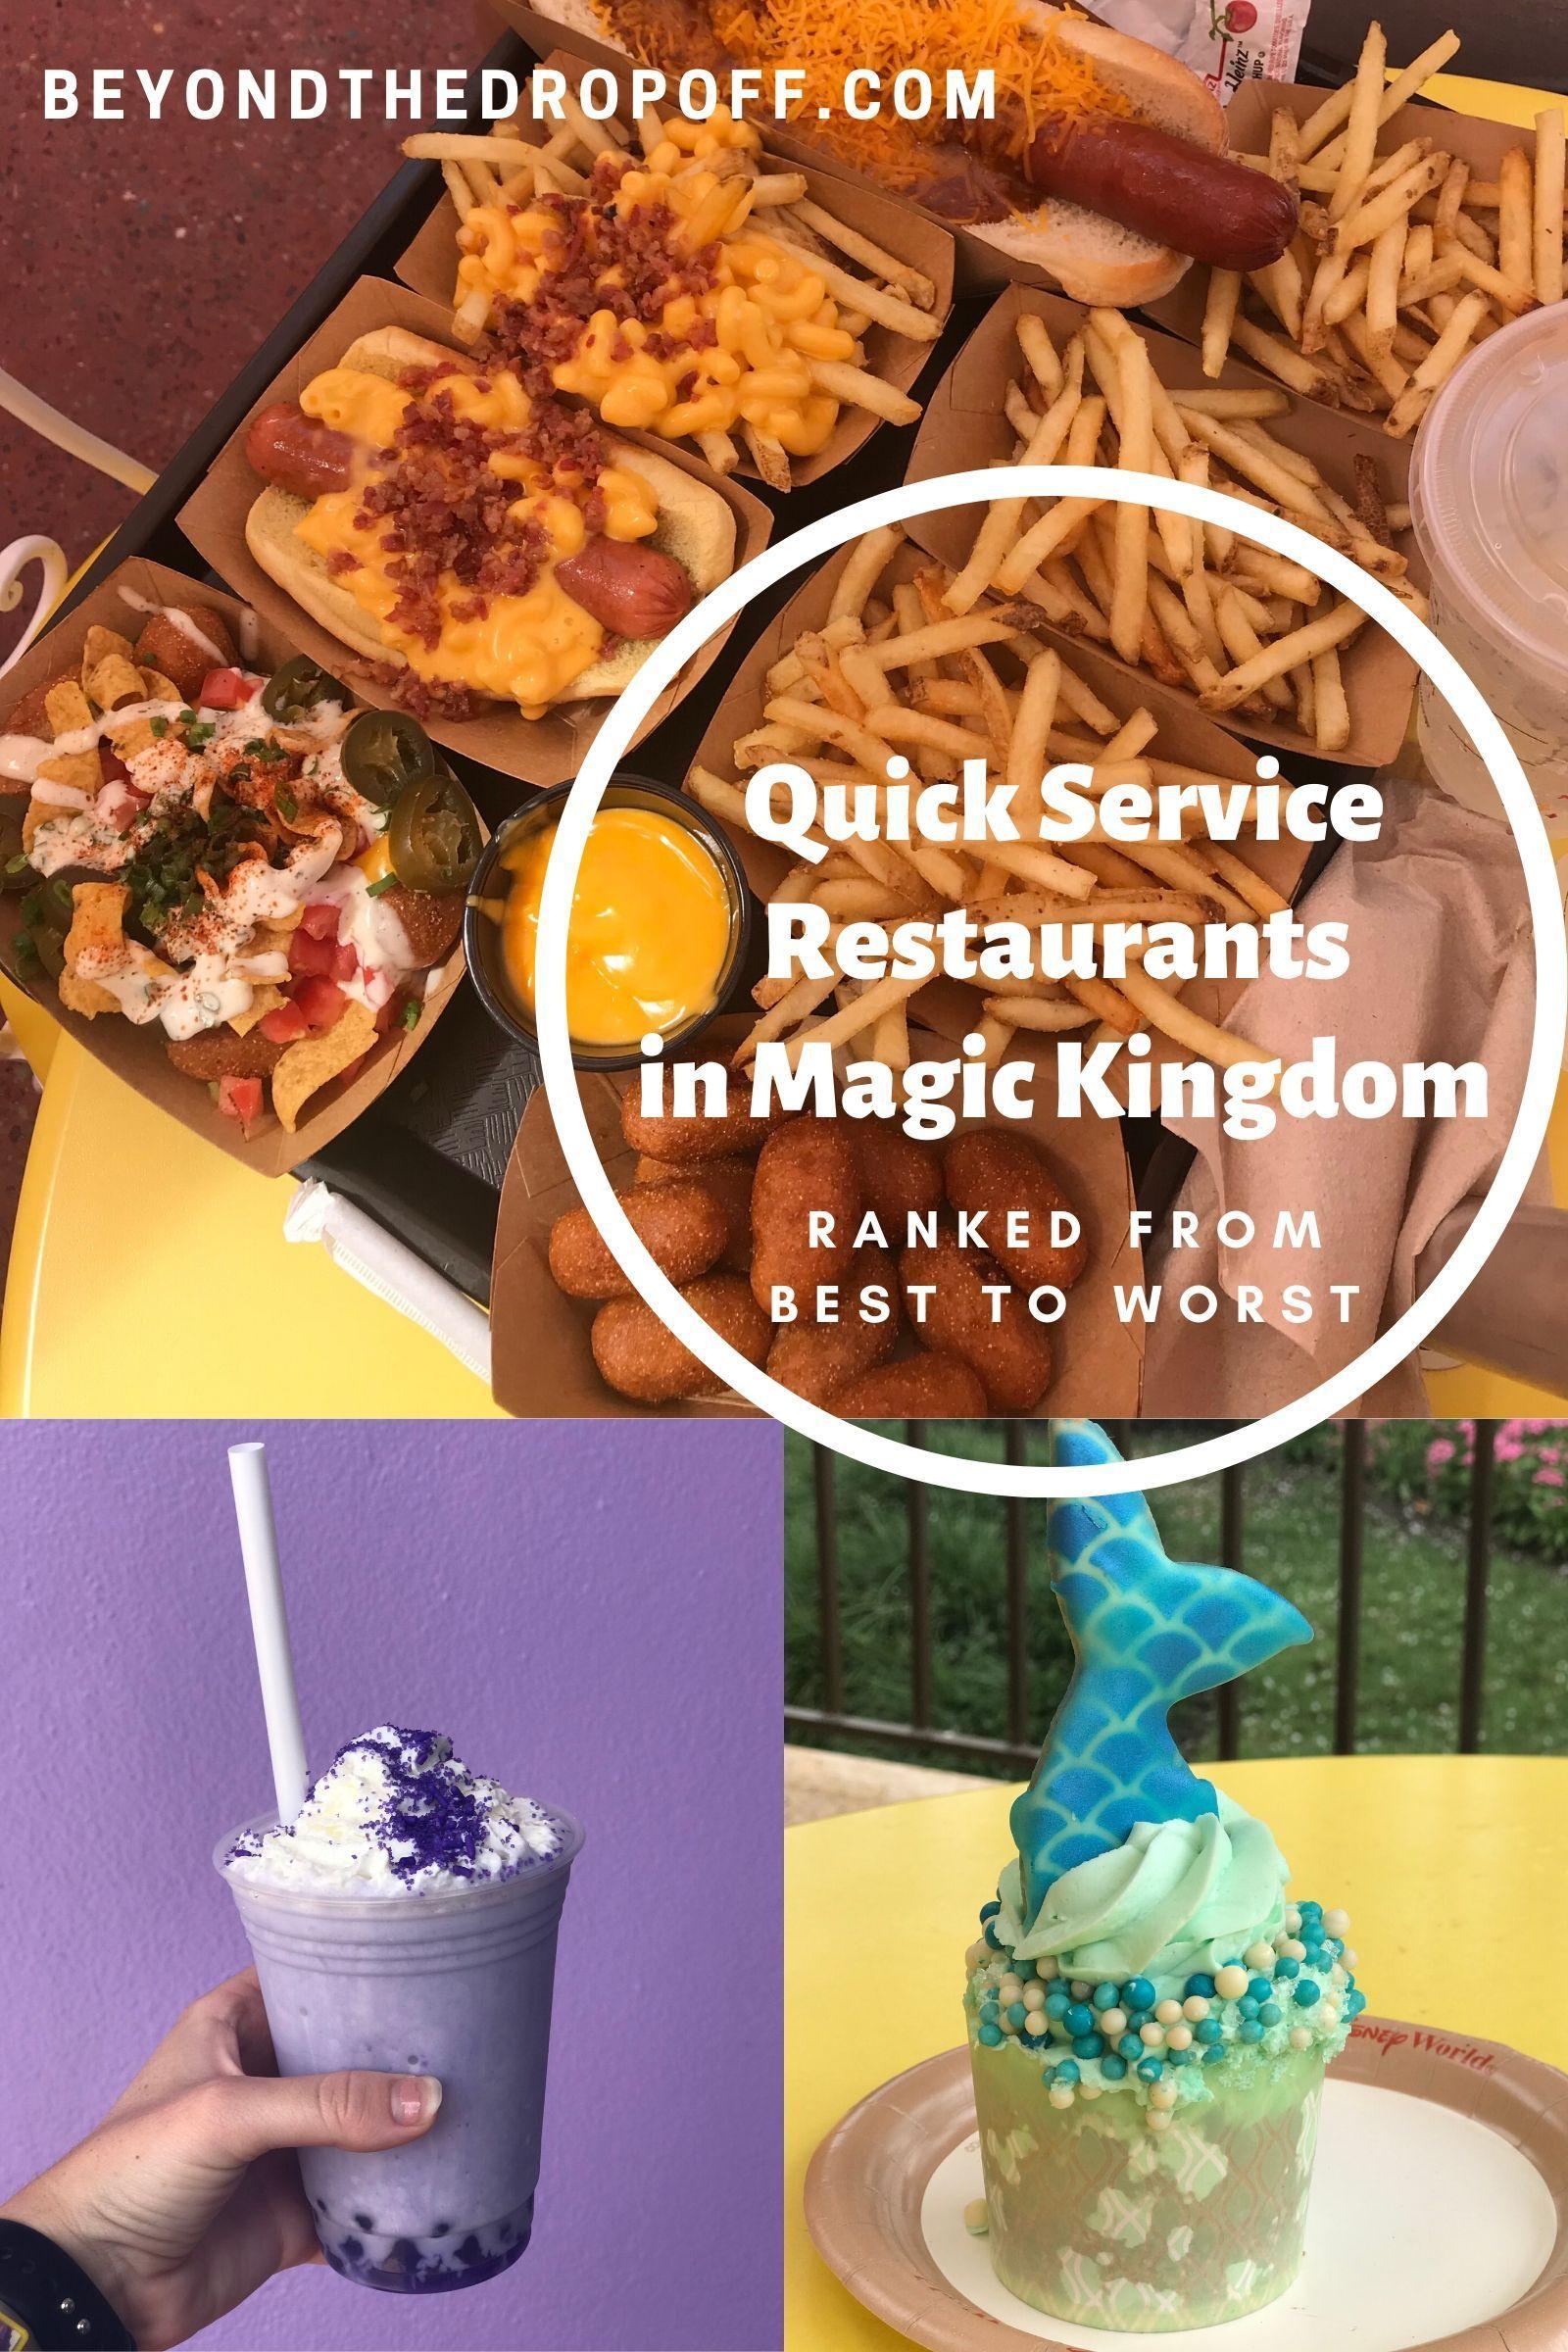 The Quick Service Restaurants In Magic Kingdom Ranked From Best To Worst Quick Service Restaurant Disney World Food Disney Dining